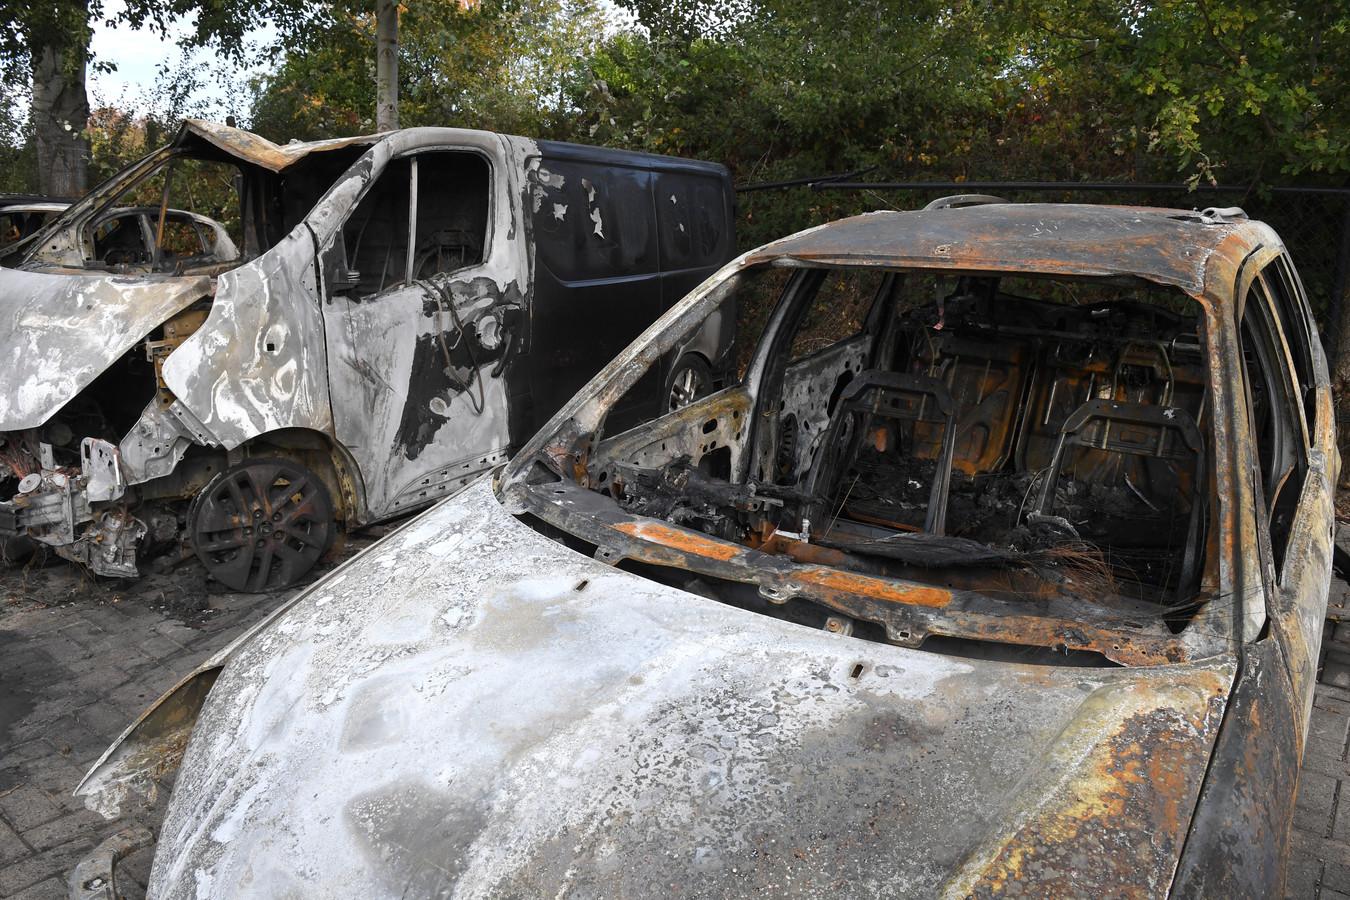 Uitgebrande auto's in Grave, oktober 2018.